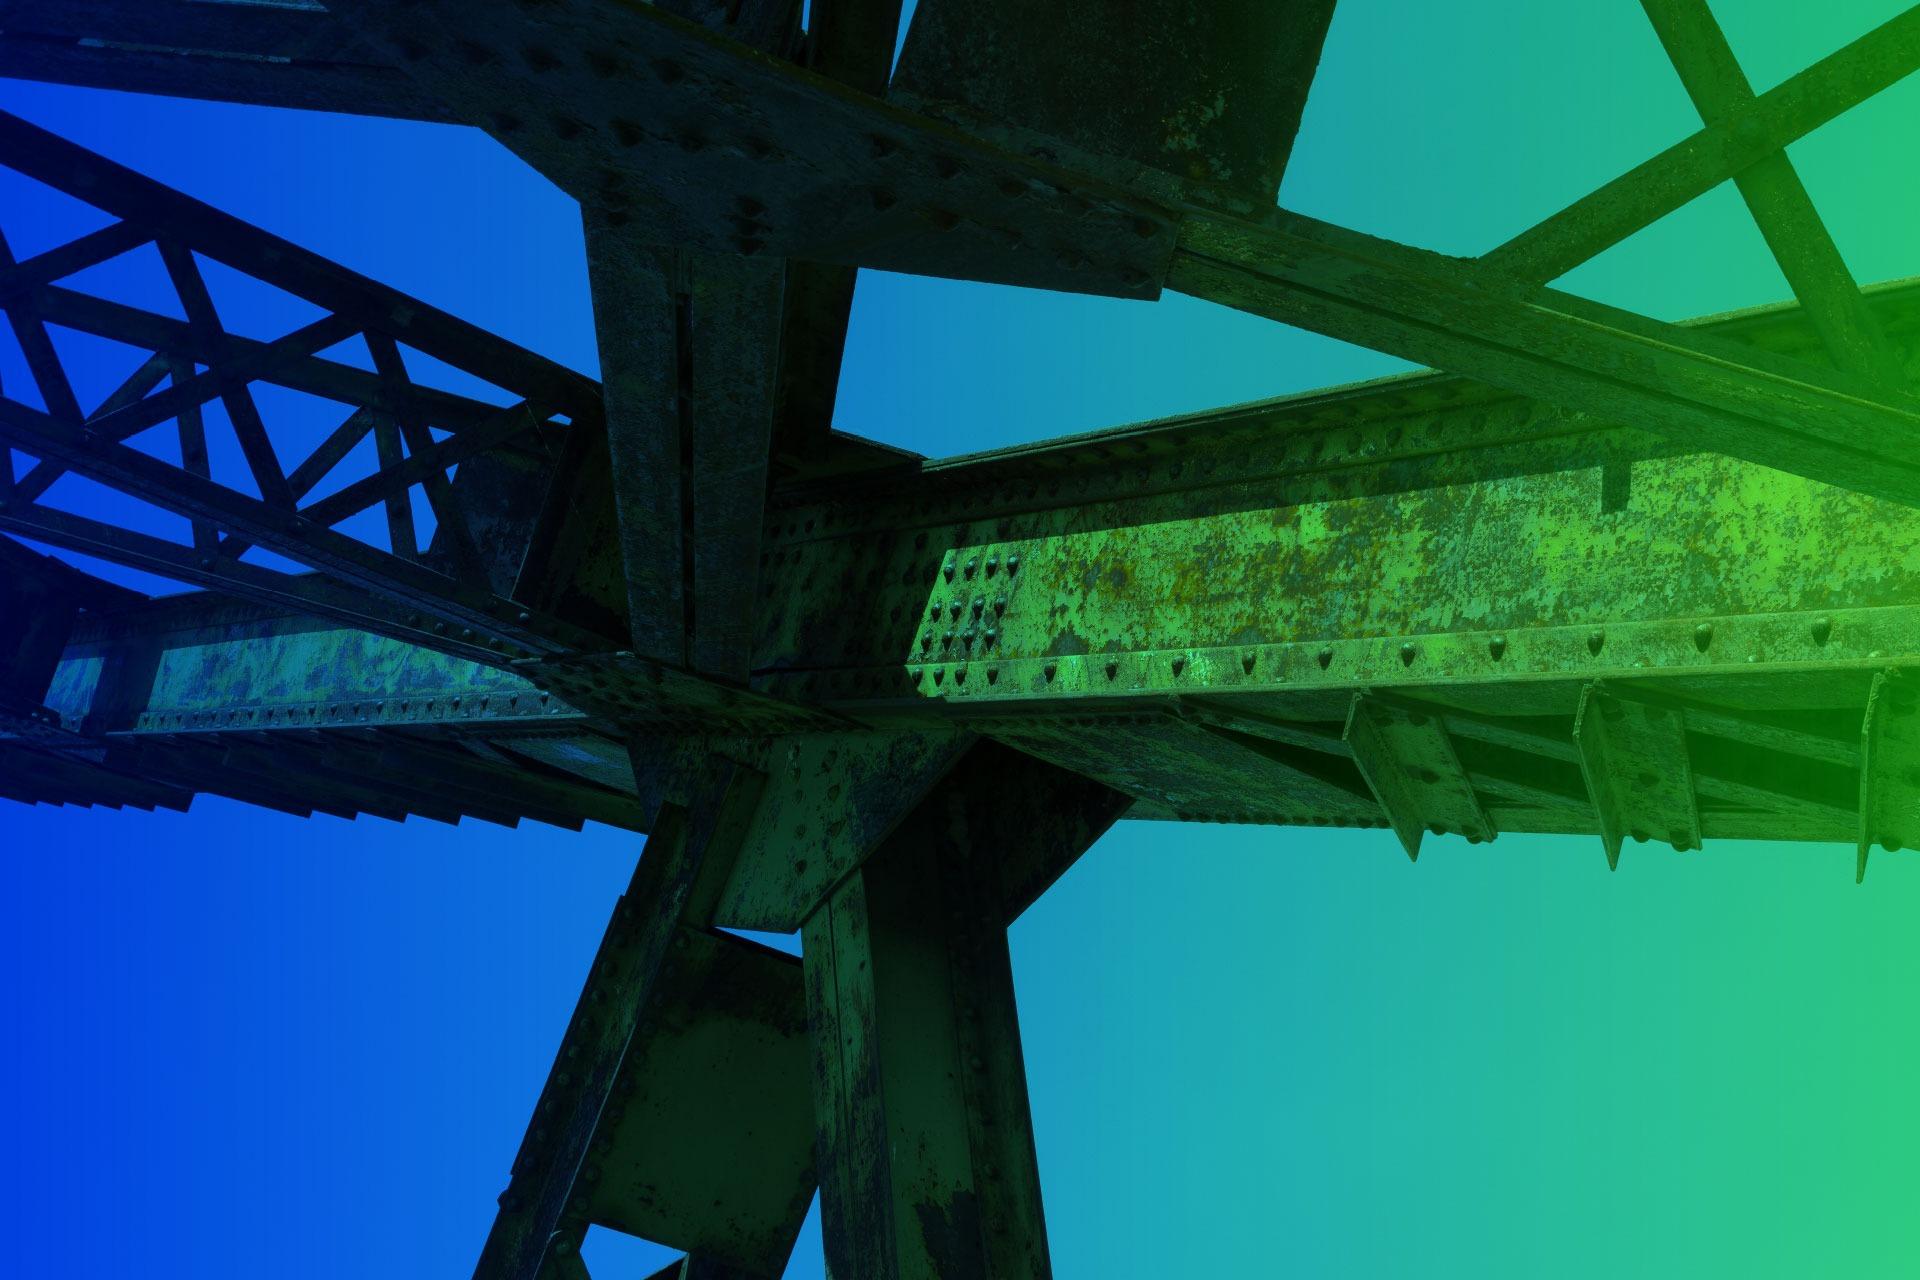 TCDF & the Corrosion Illinois Network Present 'Understanding Illinois' New Corrosion Rules'